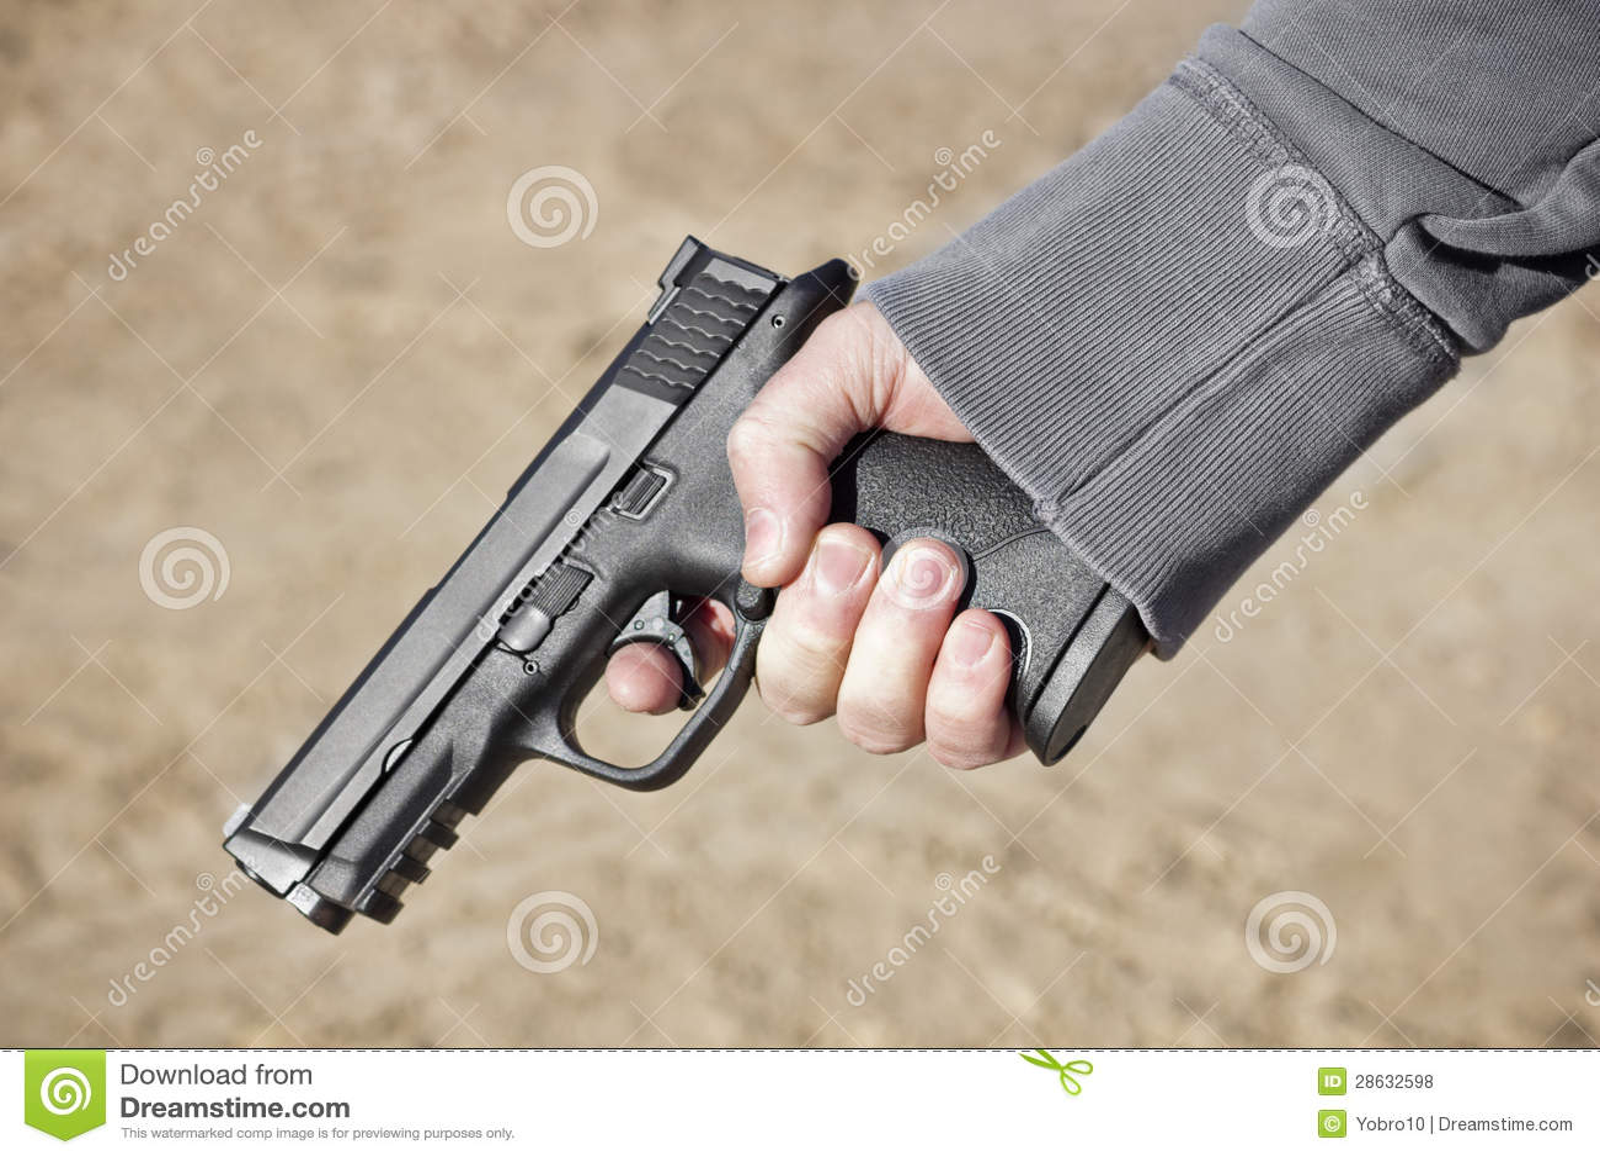 Holding A Hand Gun Royalty Free Stock Photos - Image: 28632598